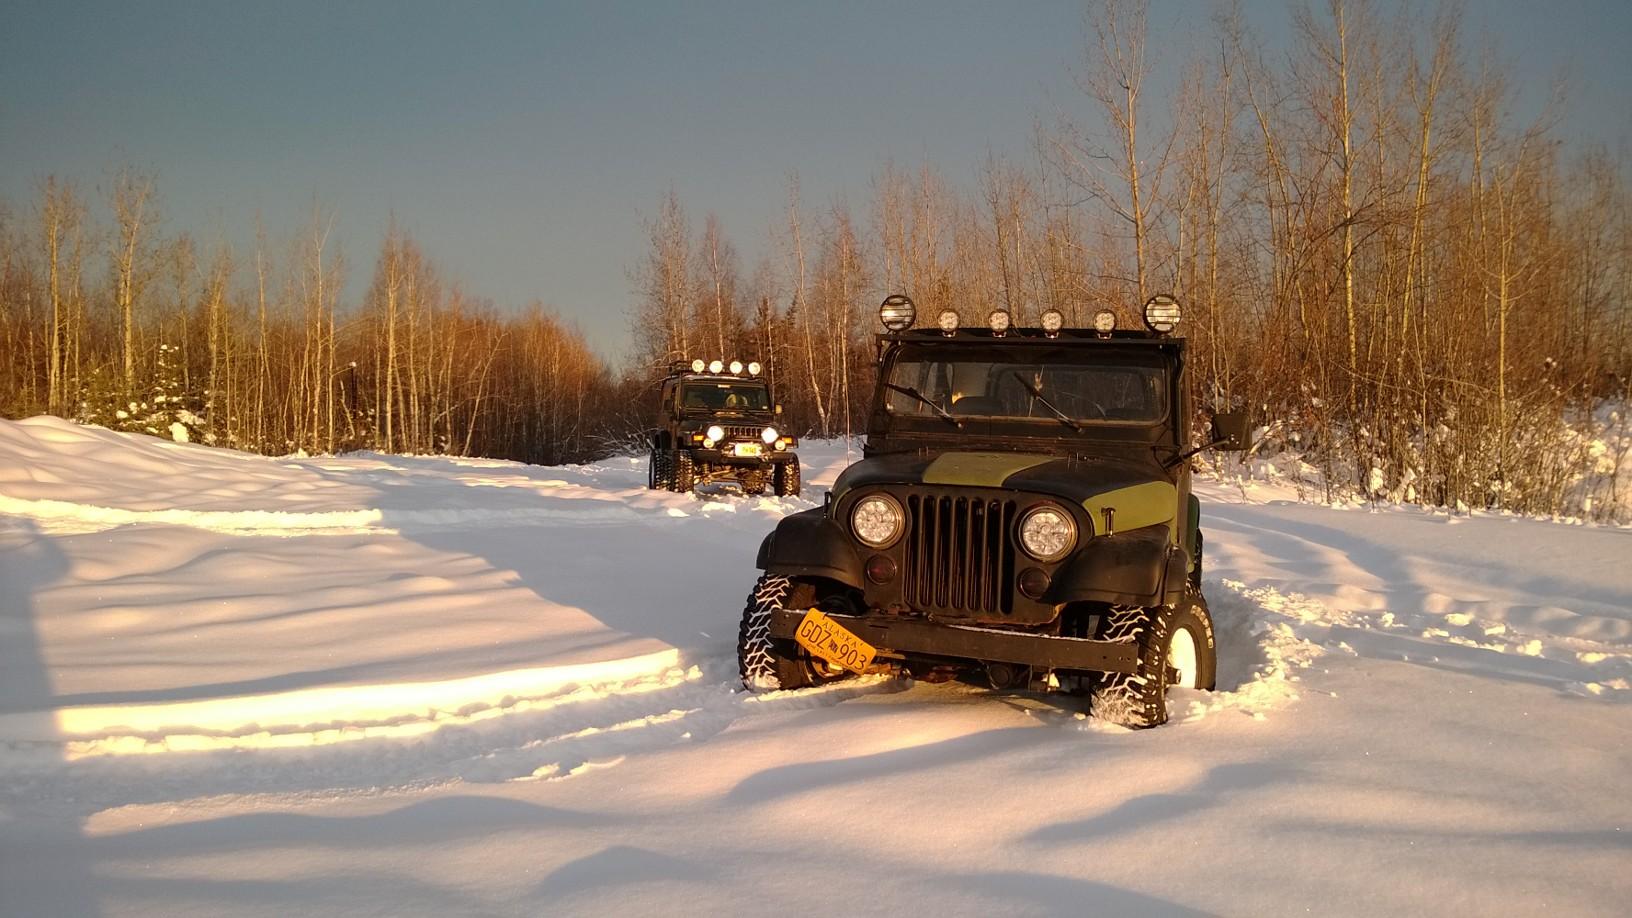 jeep-pic-4.jpg